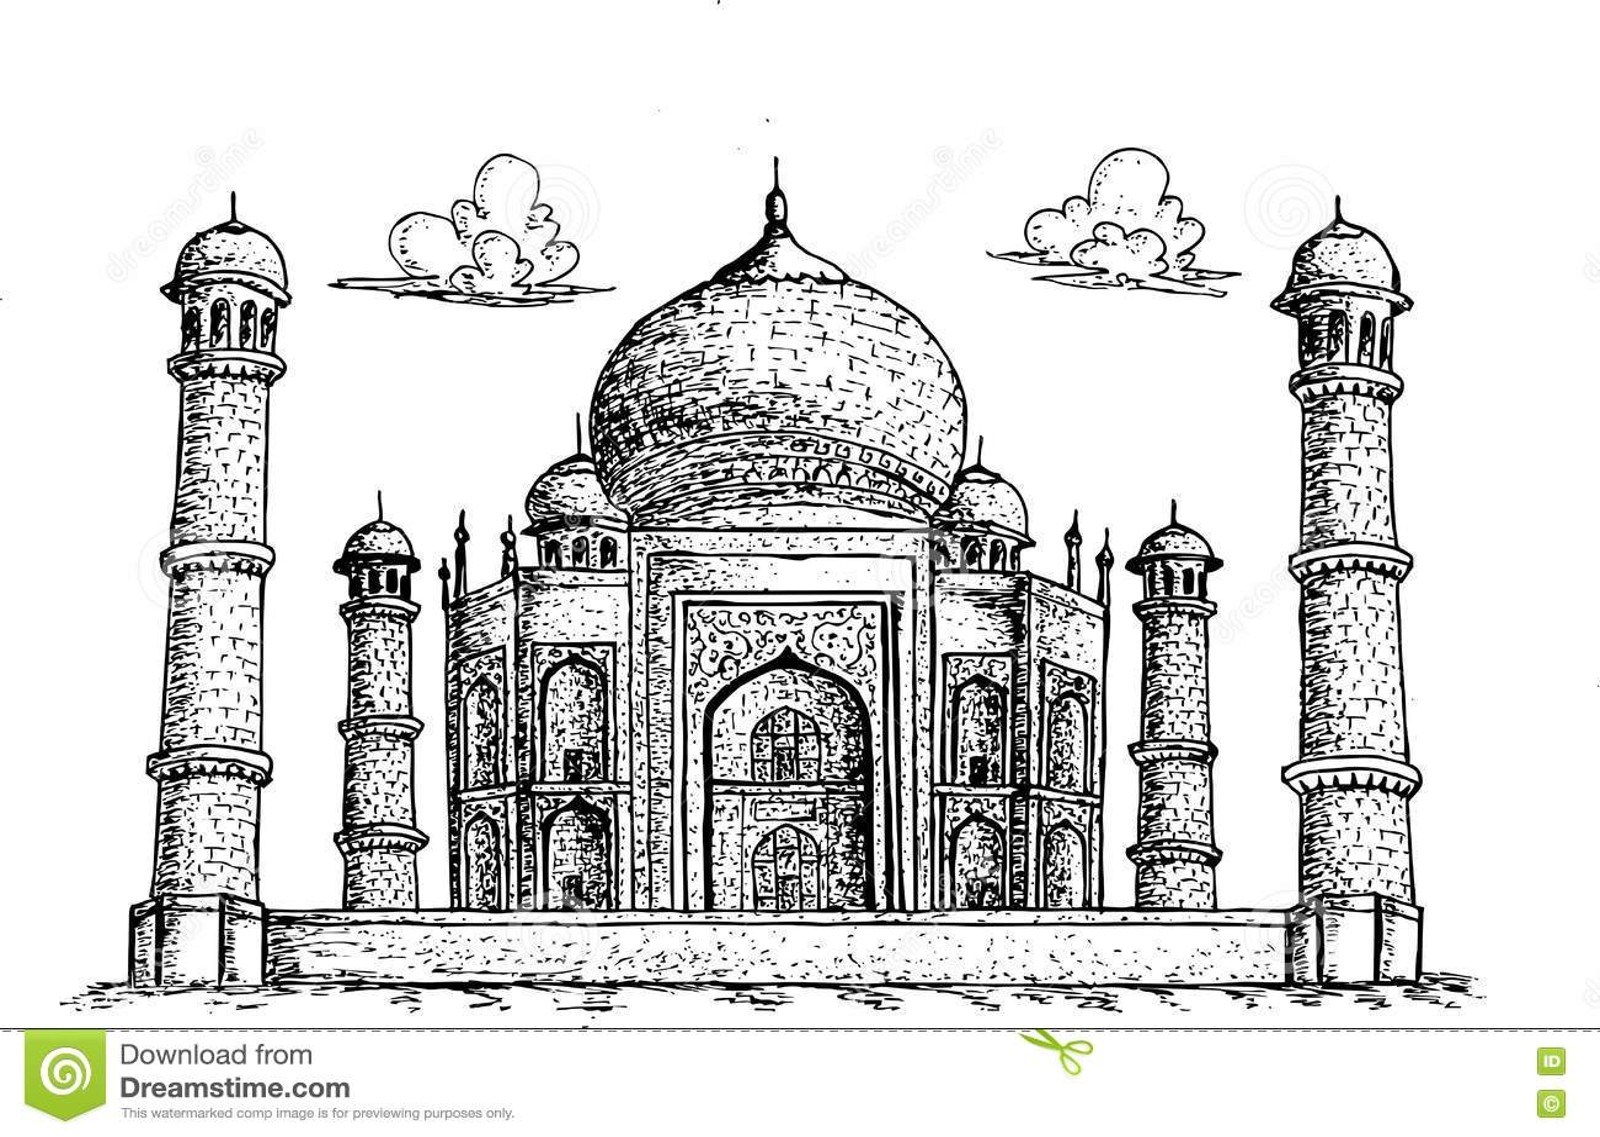 Line Drawing Of Qutub Minar : Taj mahal agra india hand drawn illustration stock vector